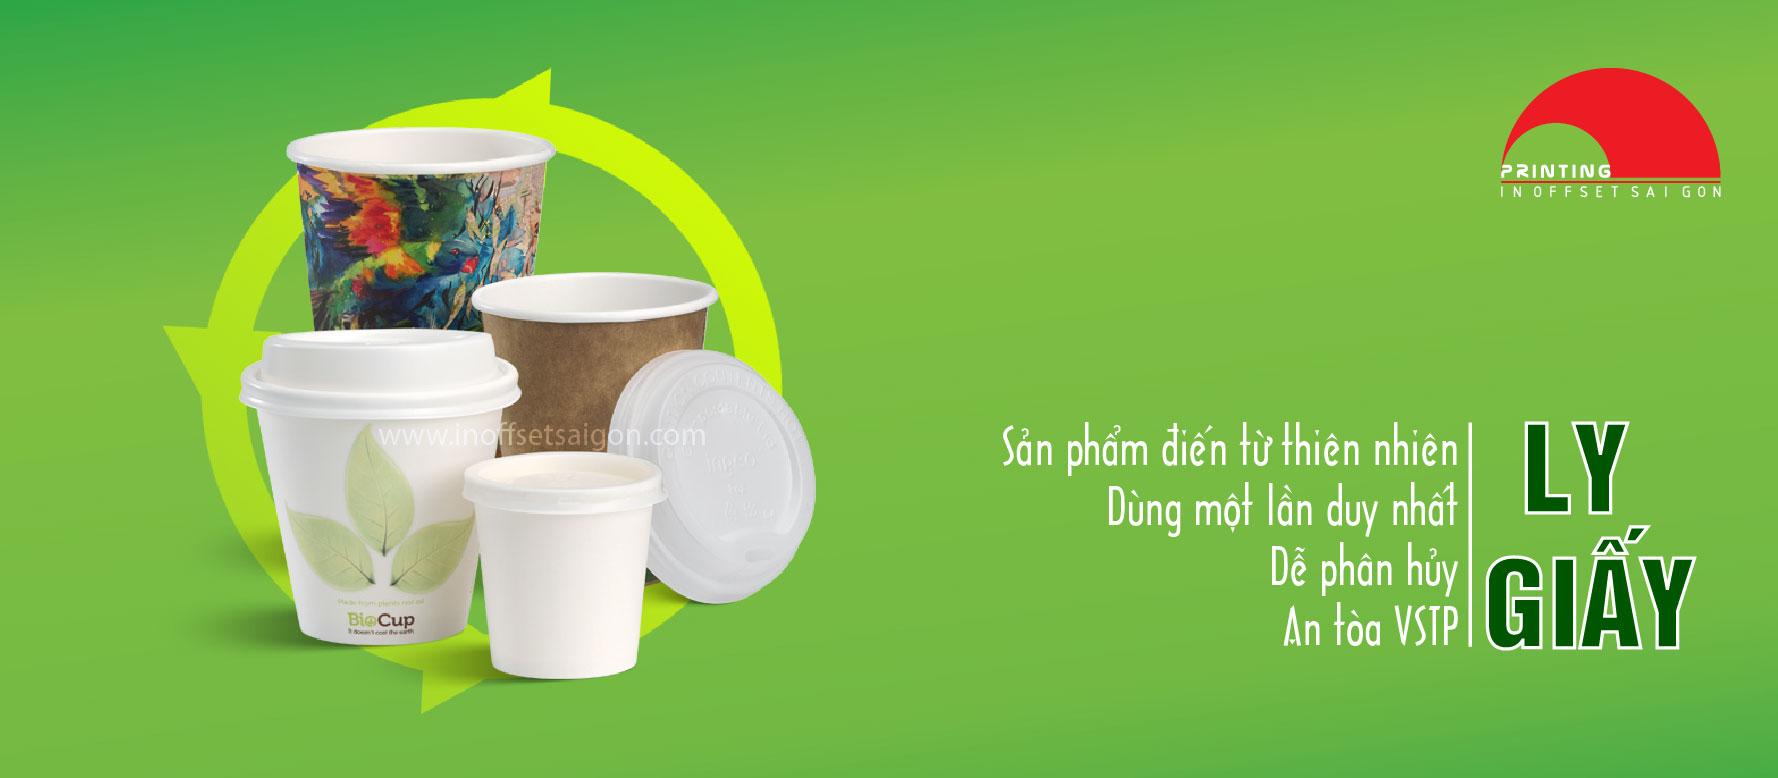 ly giấy cà phê mang đi, ly giấy takeaway, ly giấy coffee togo, ly giấy 14oz, ly giấy thực phẩm